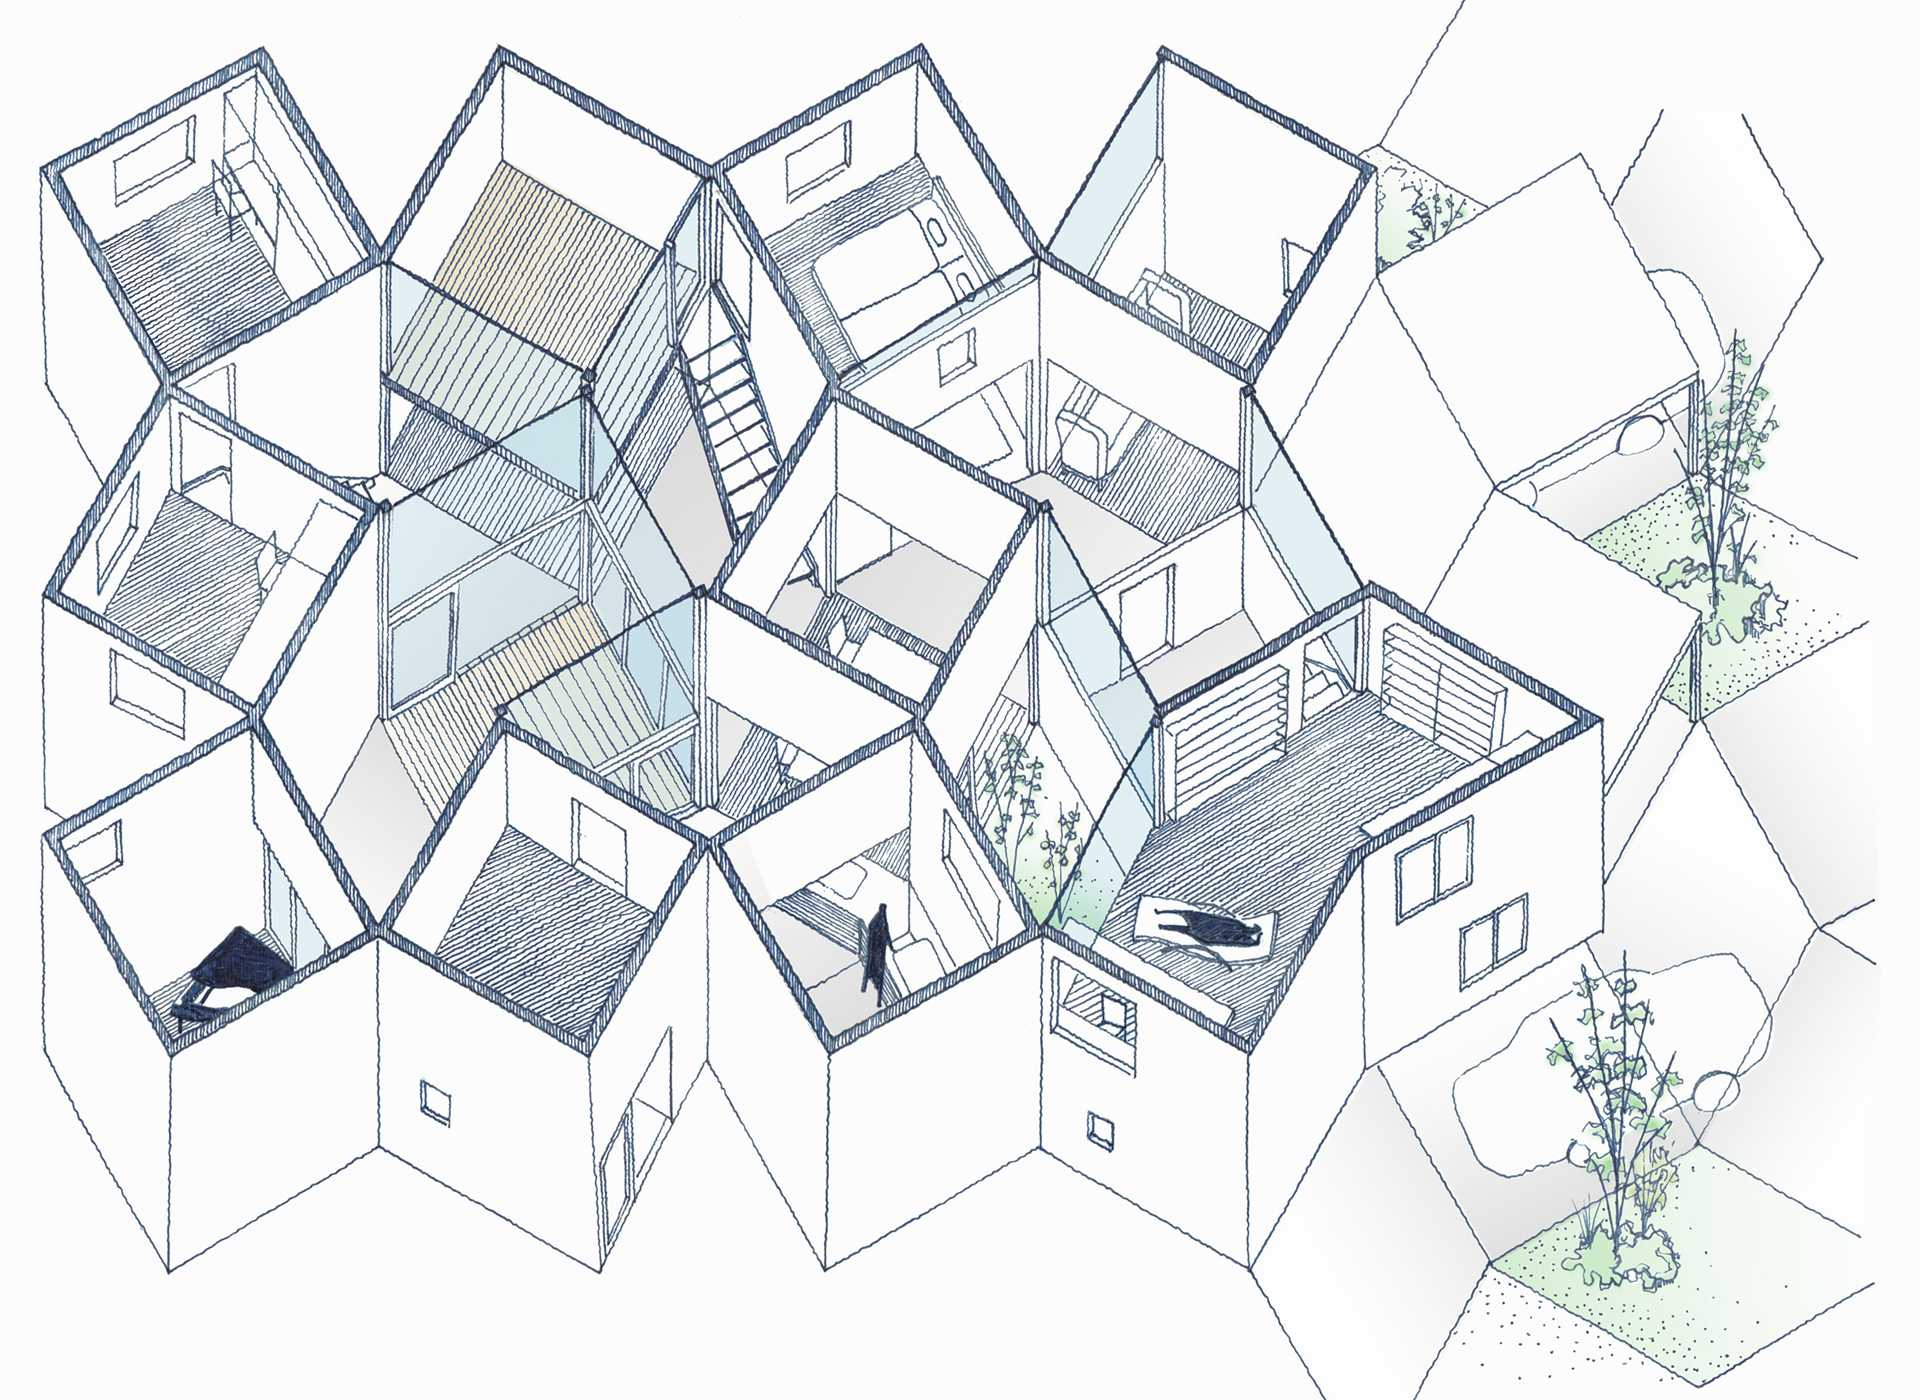 House in Hokusetsu  - 34 11 55